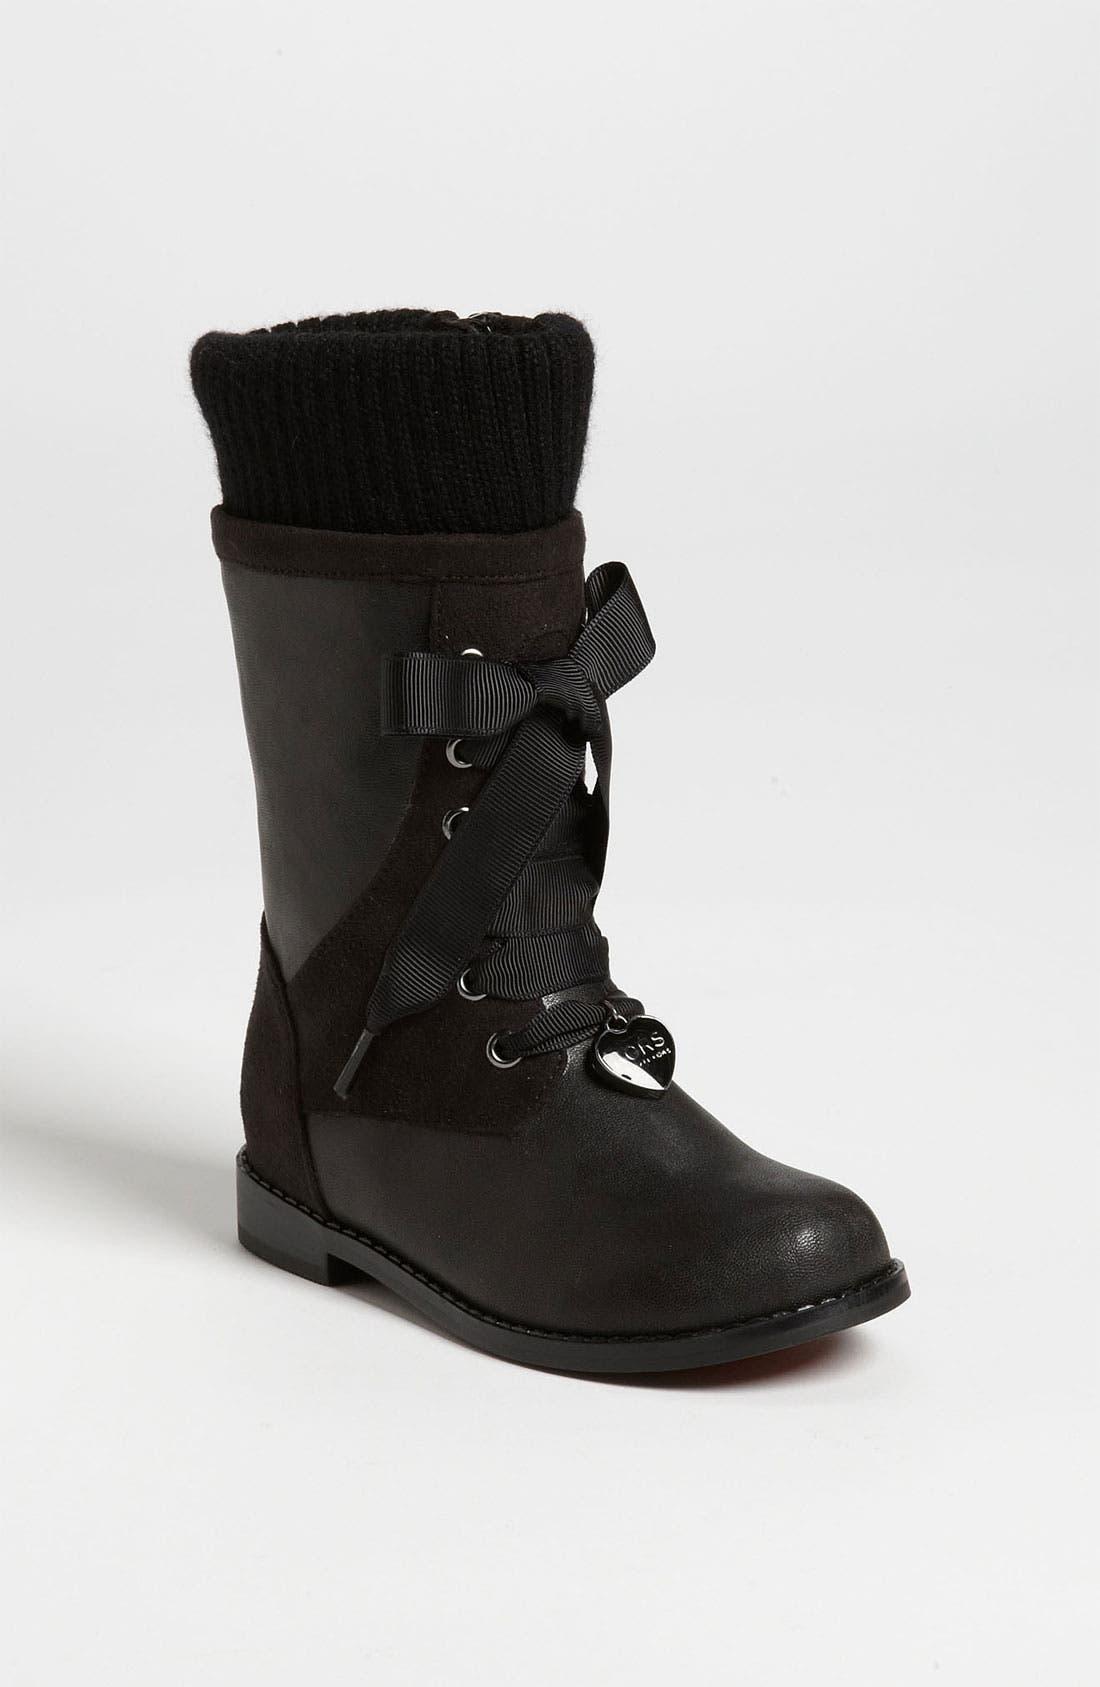 Alternate Image 1 Selected - KORS Michael Kors 'Bambi' Boot (Toddler)